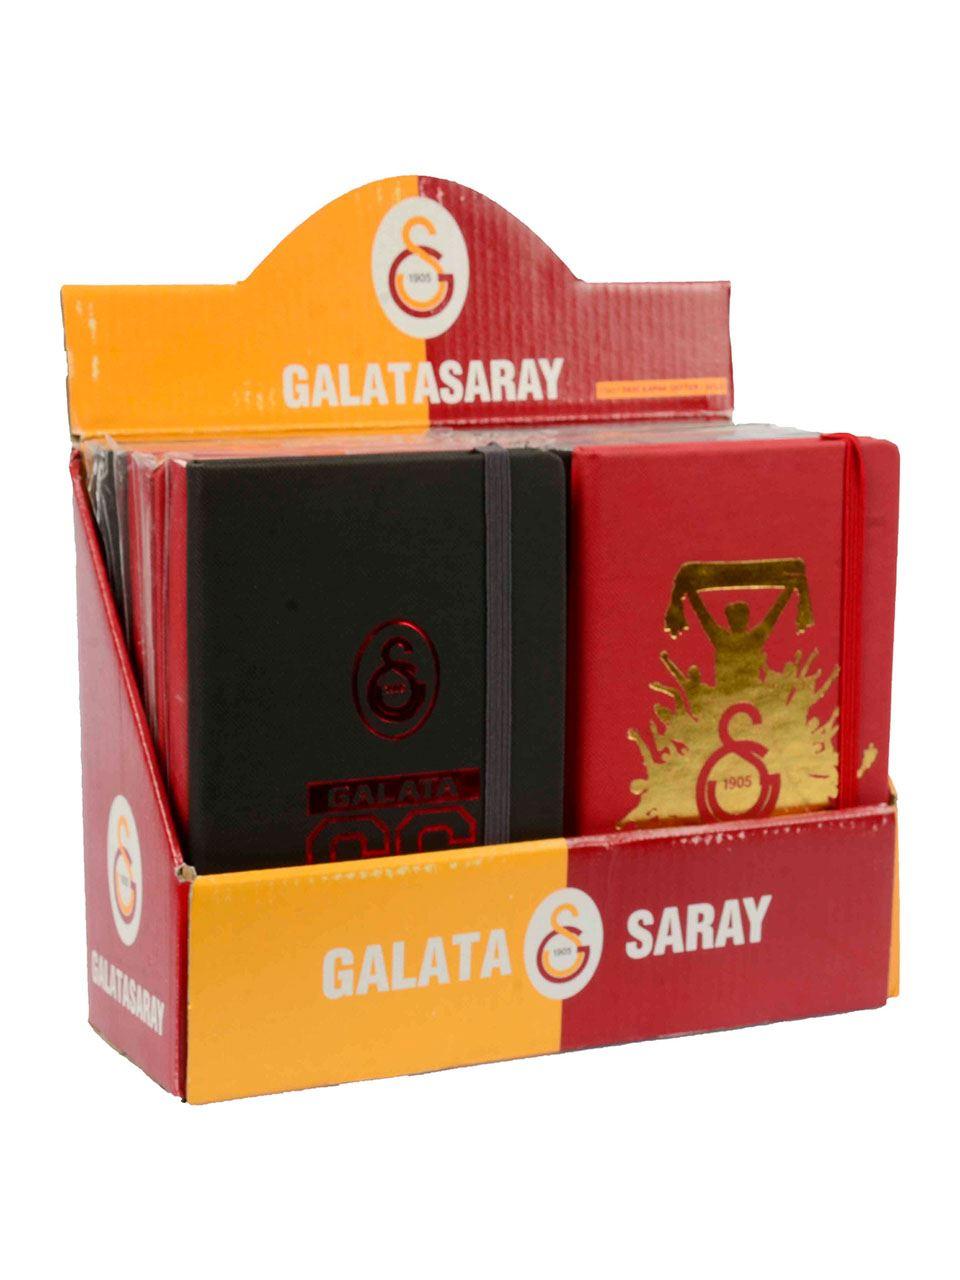 GALATASARAY SERT KPK NOT DEFTERİ 12X17 112yp